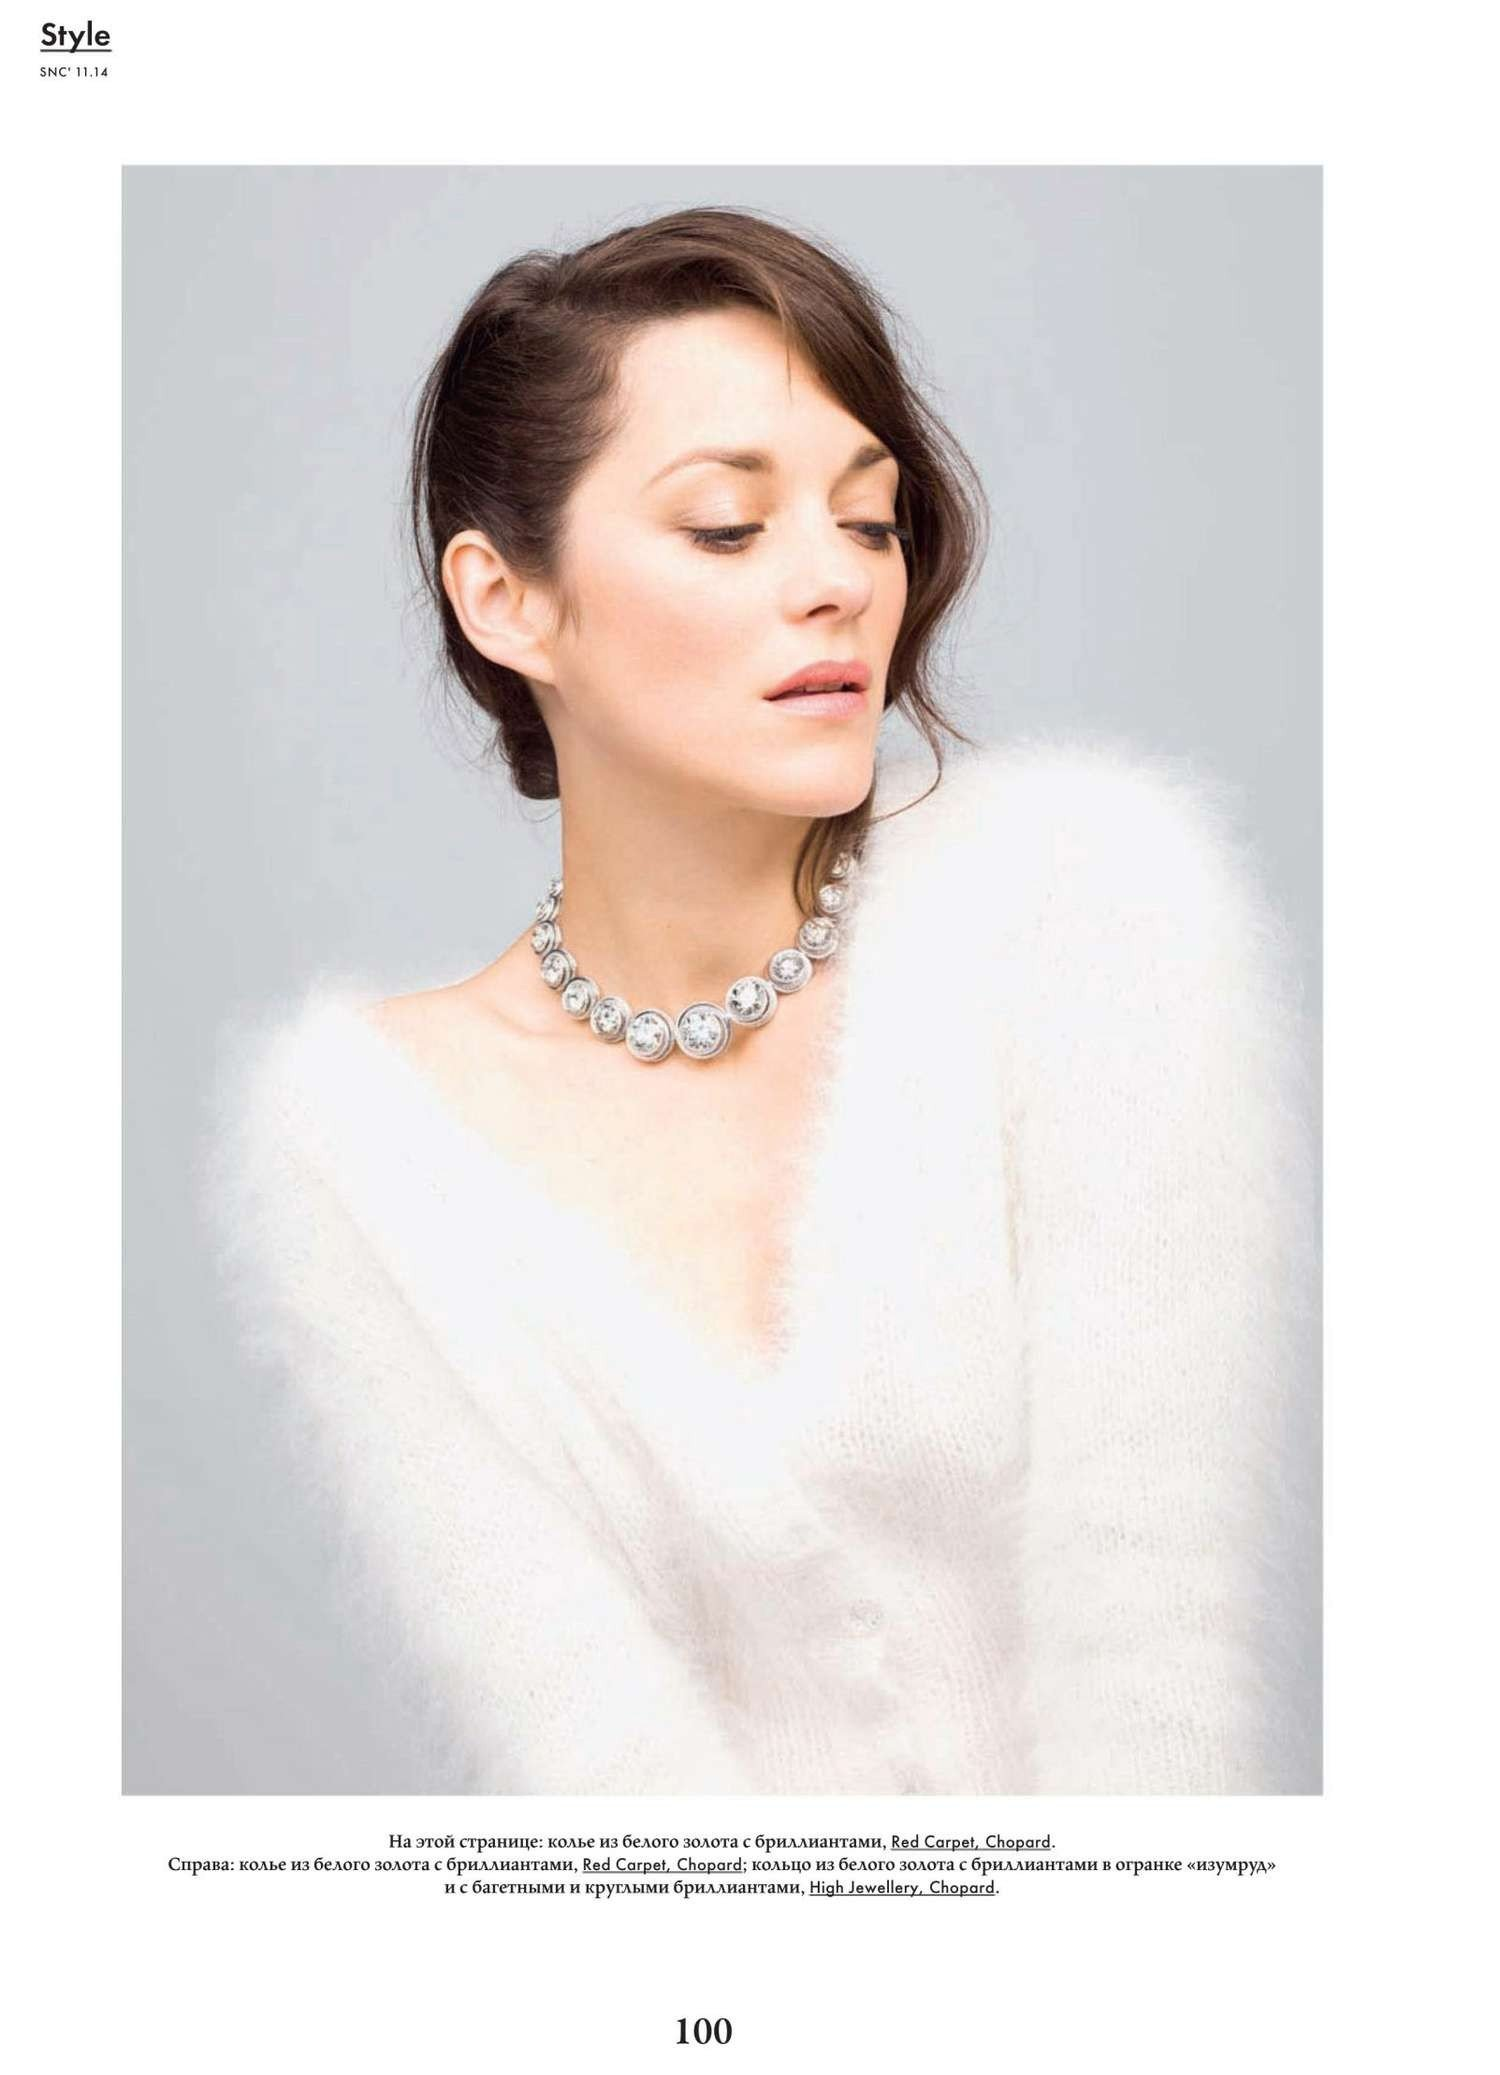 celebrity, Marion Cotillard Wallpaper